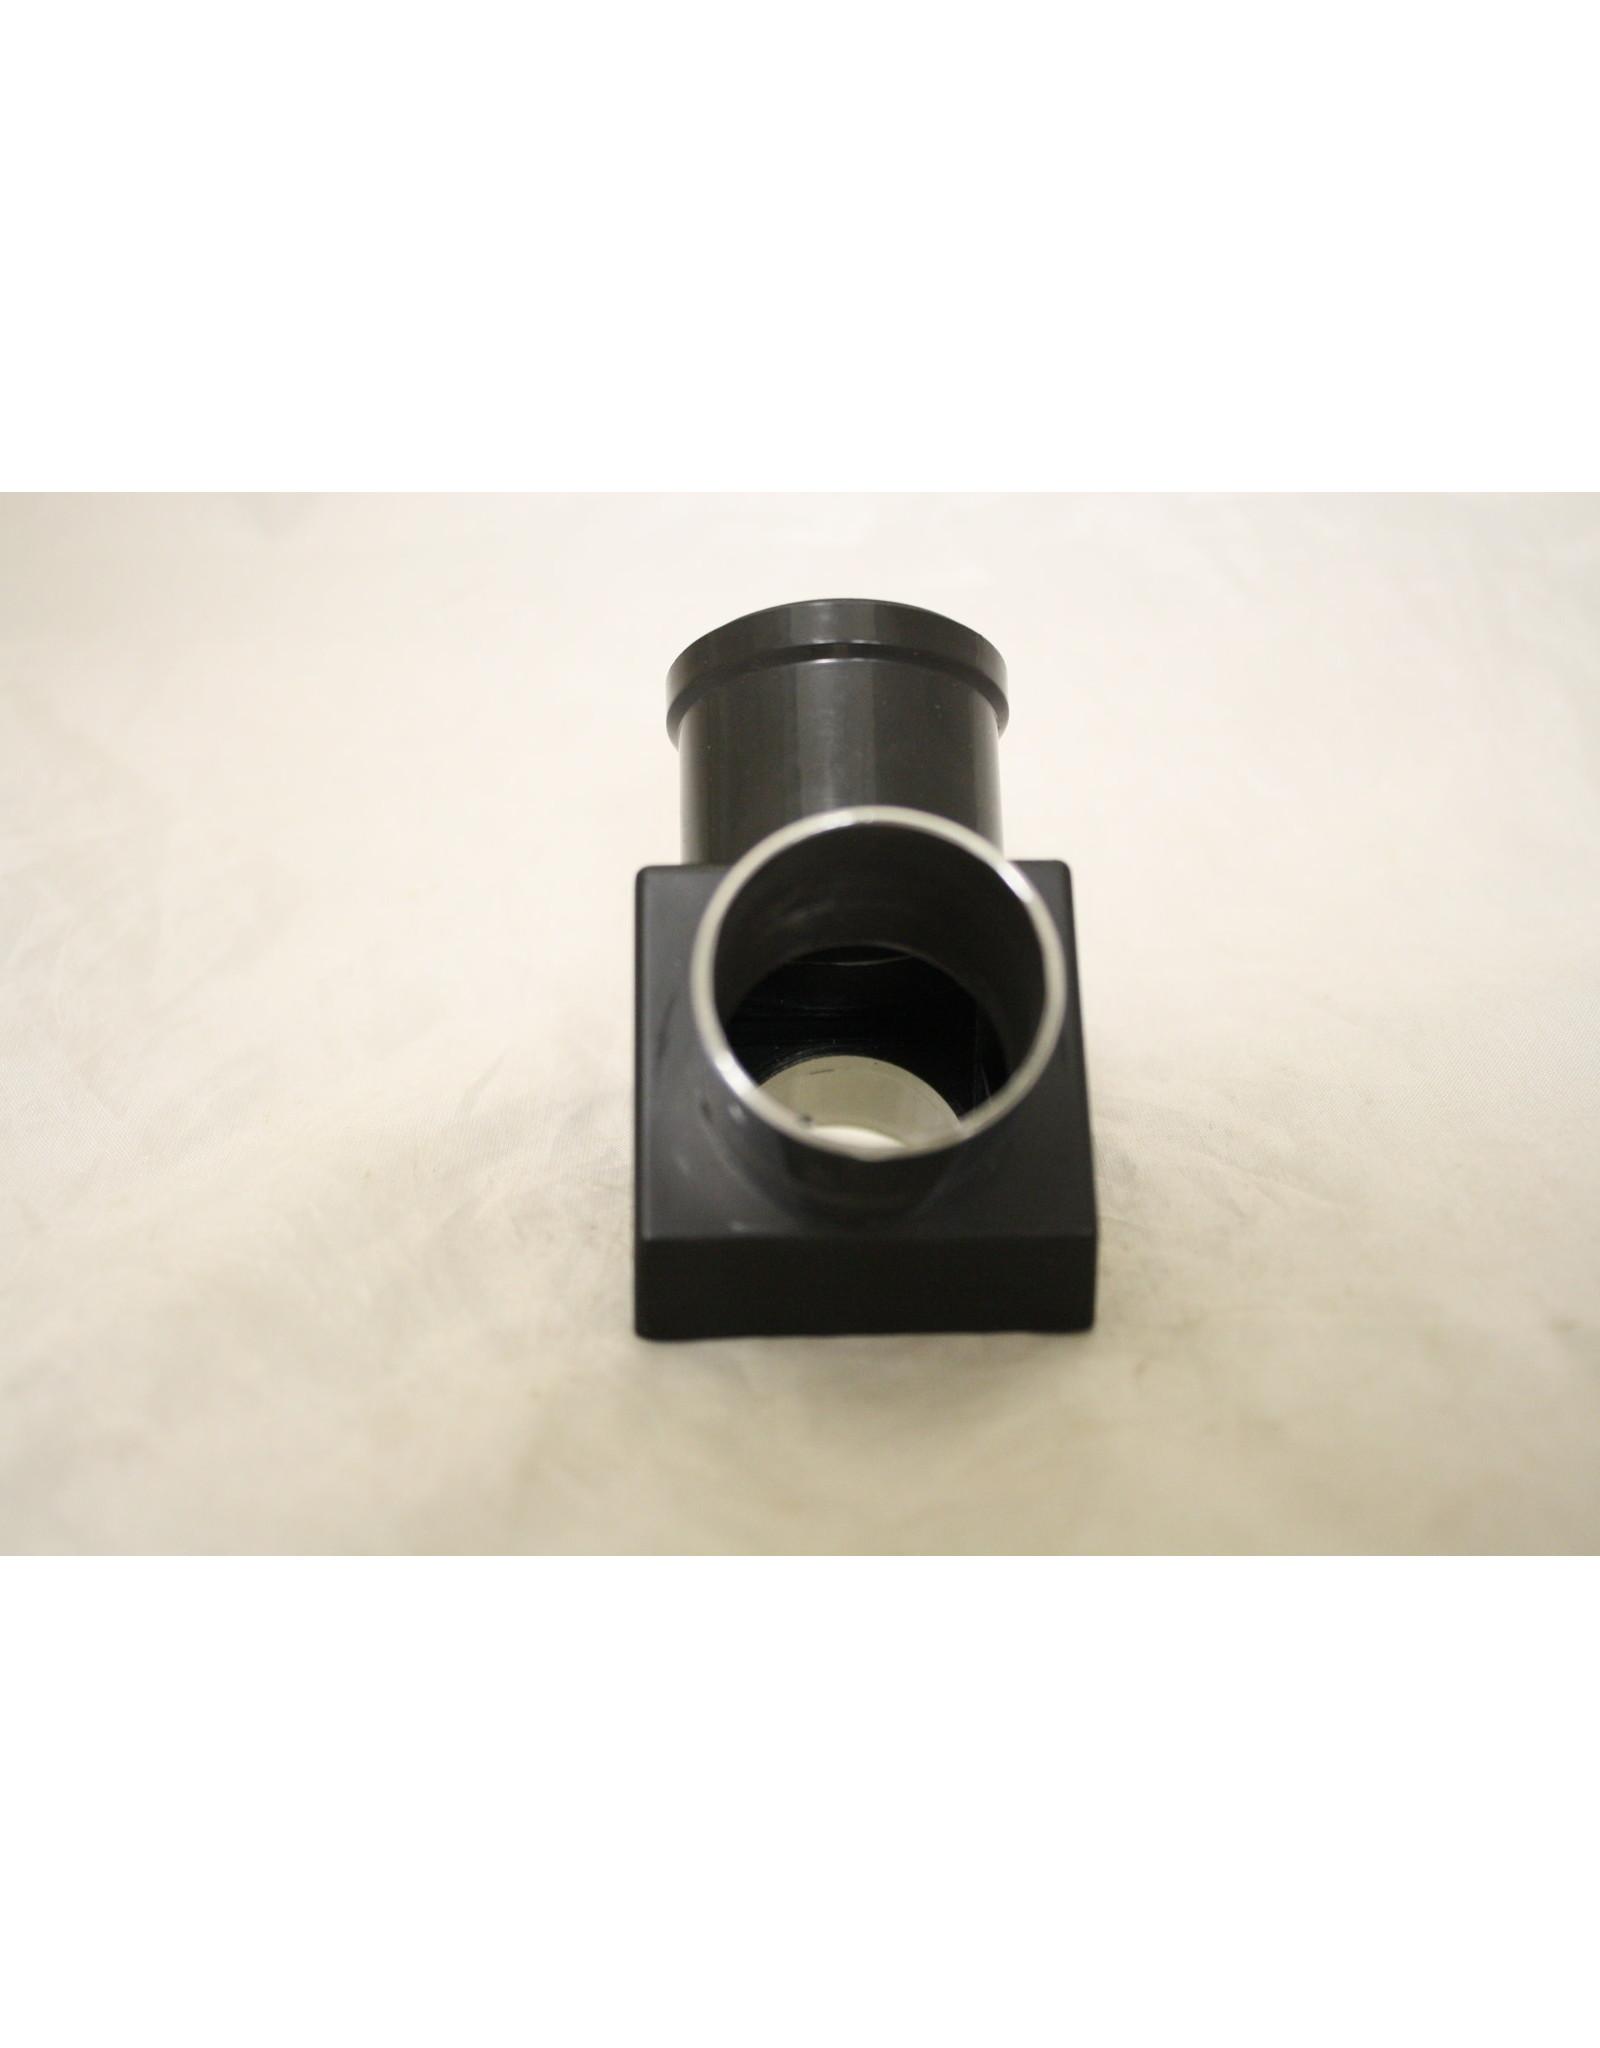 Arcturus Diagonal 1.25 inch Mirror Diagonal (Pre-owned)